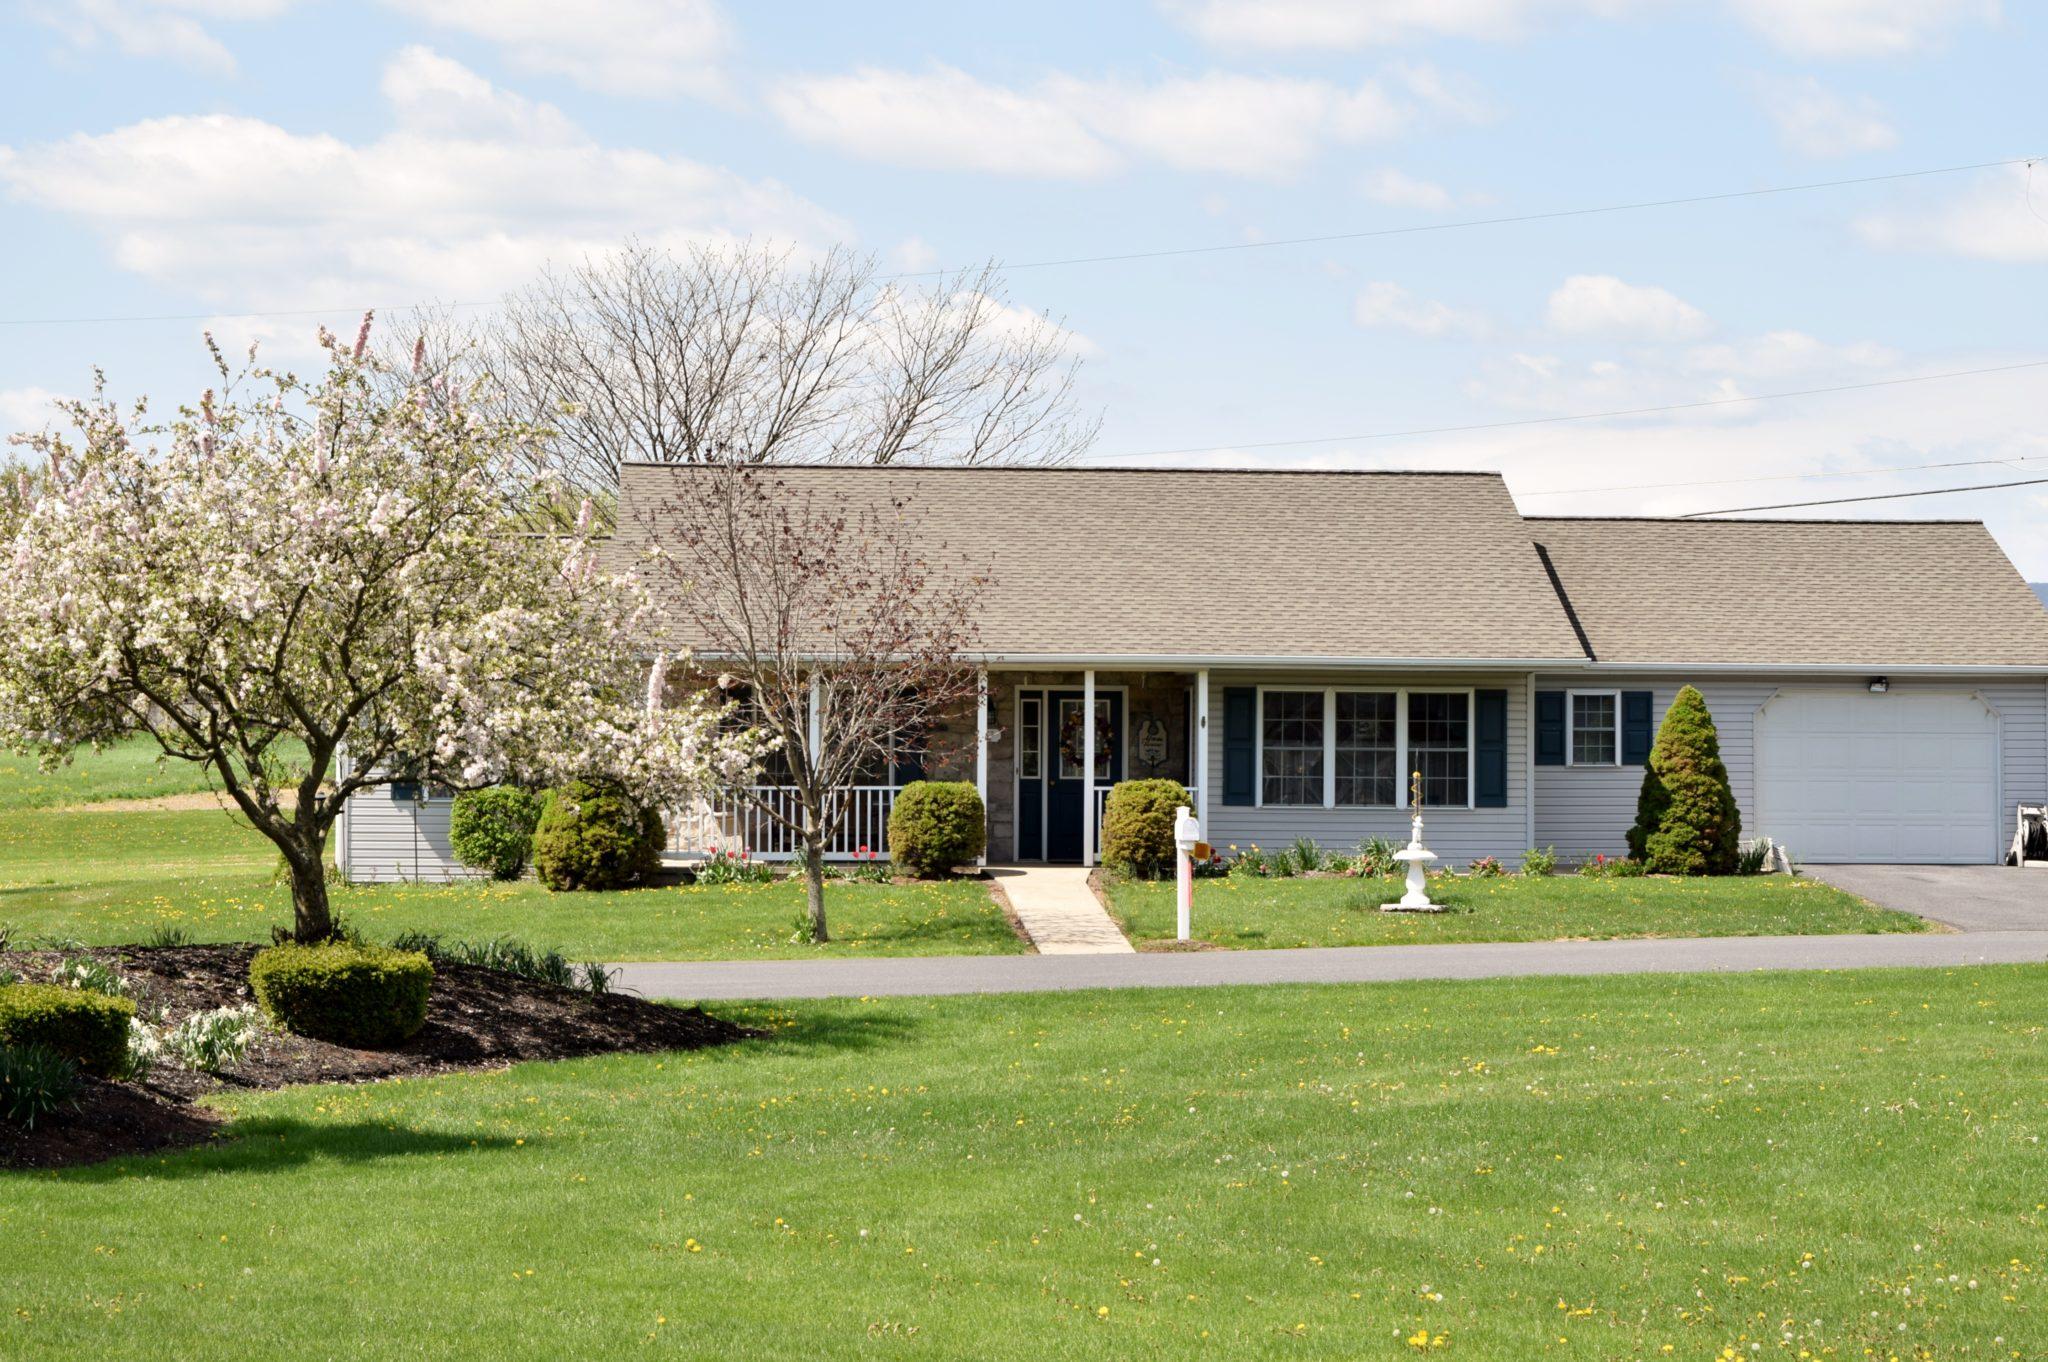 Brookline Village Senior Living Center in Mifflintown, PA   Senior Care Facility